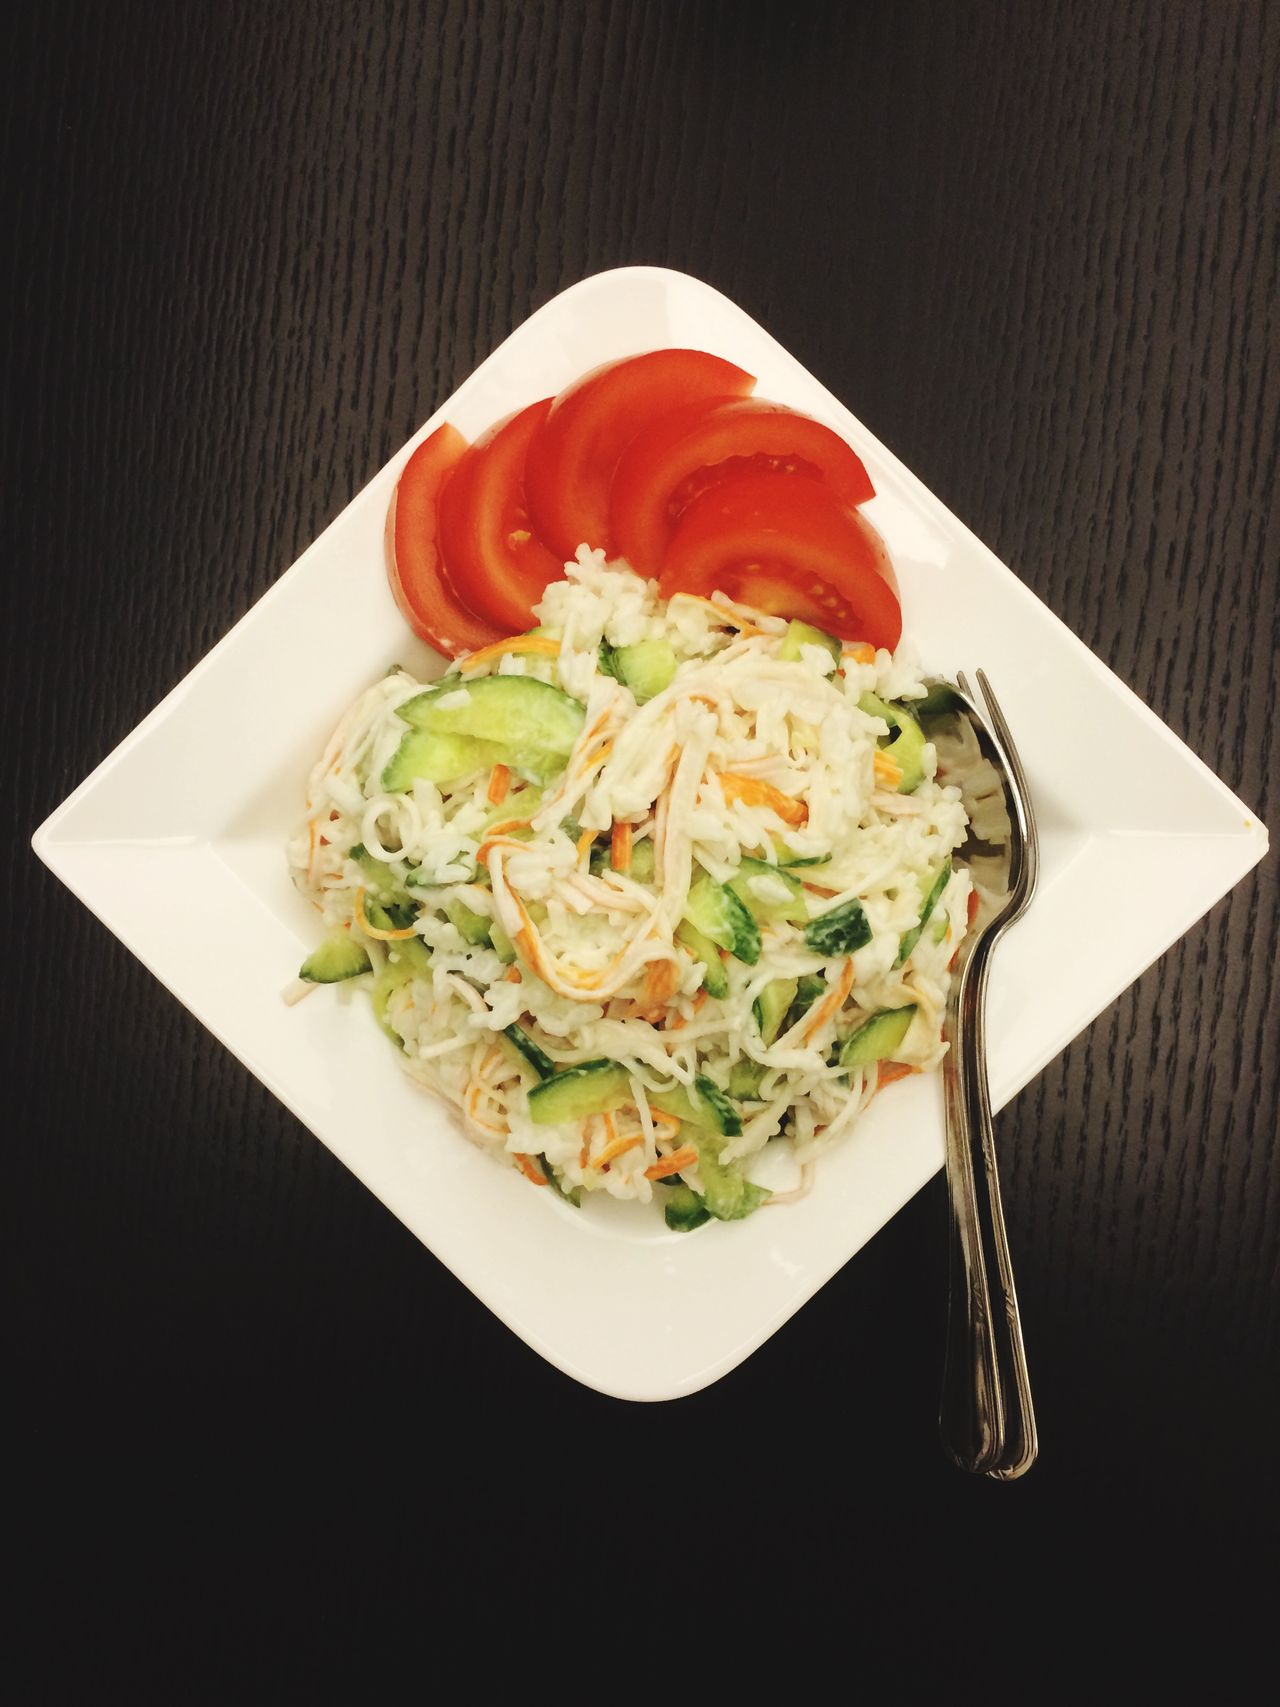 Surimi Crab Stick Salad Foodporn